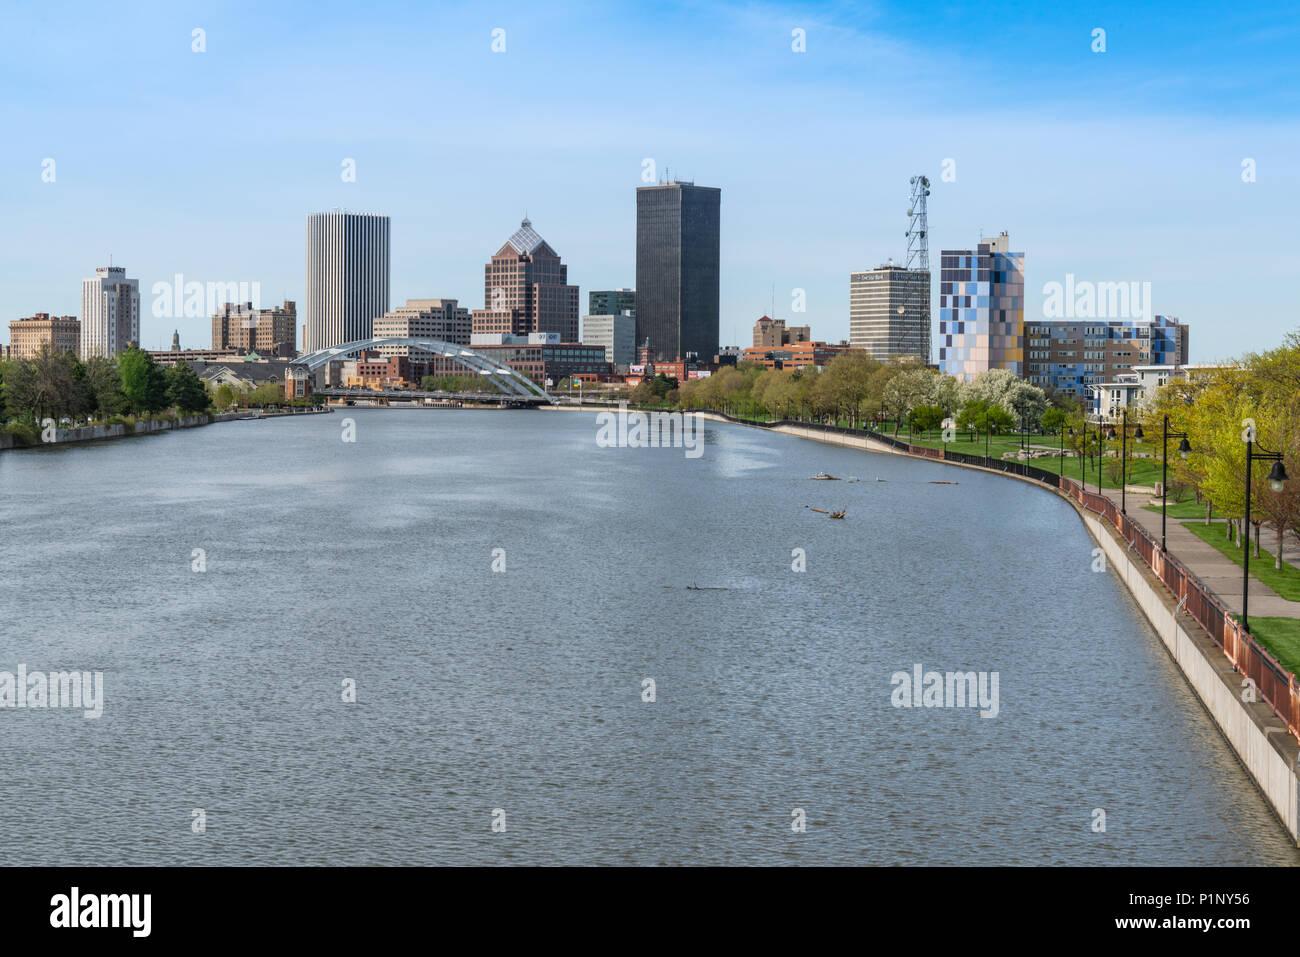 ROCHESTER, NY - 14. MAI 2018: Skyline von Rochester, New York entlang der Genesee River Stockfoto